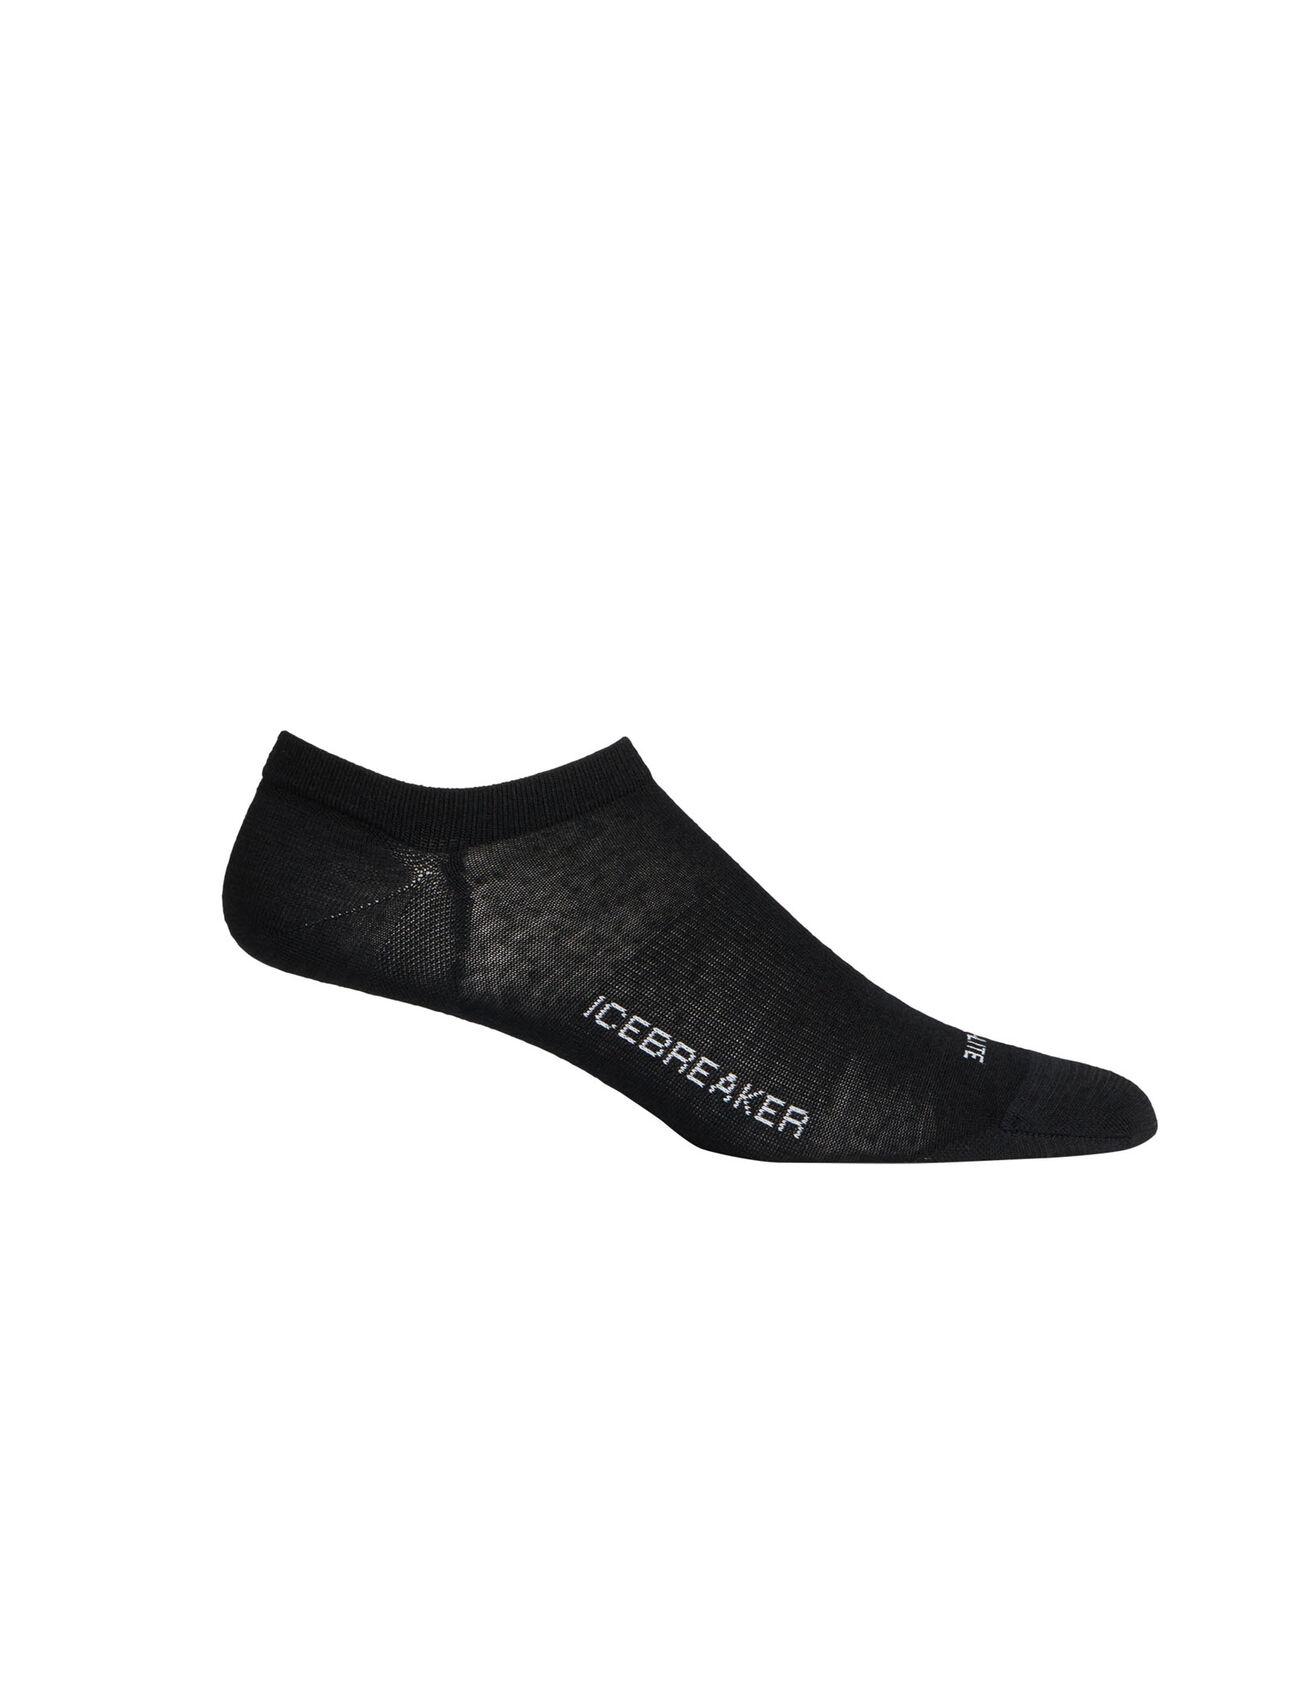 休闲系列Cool-Lite隐形袜